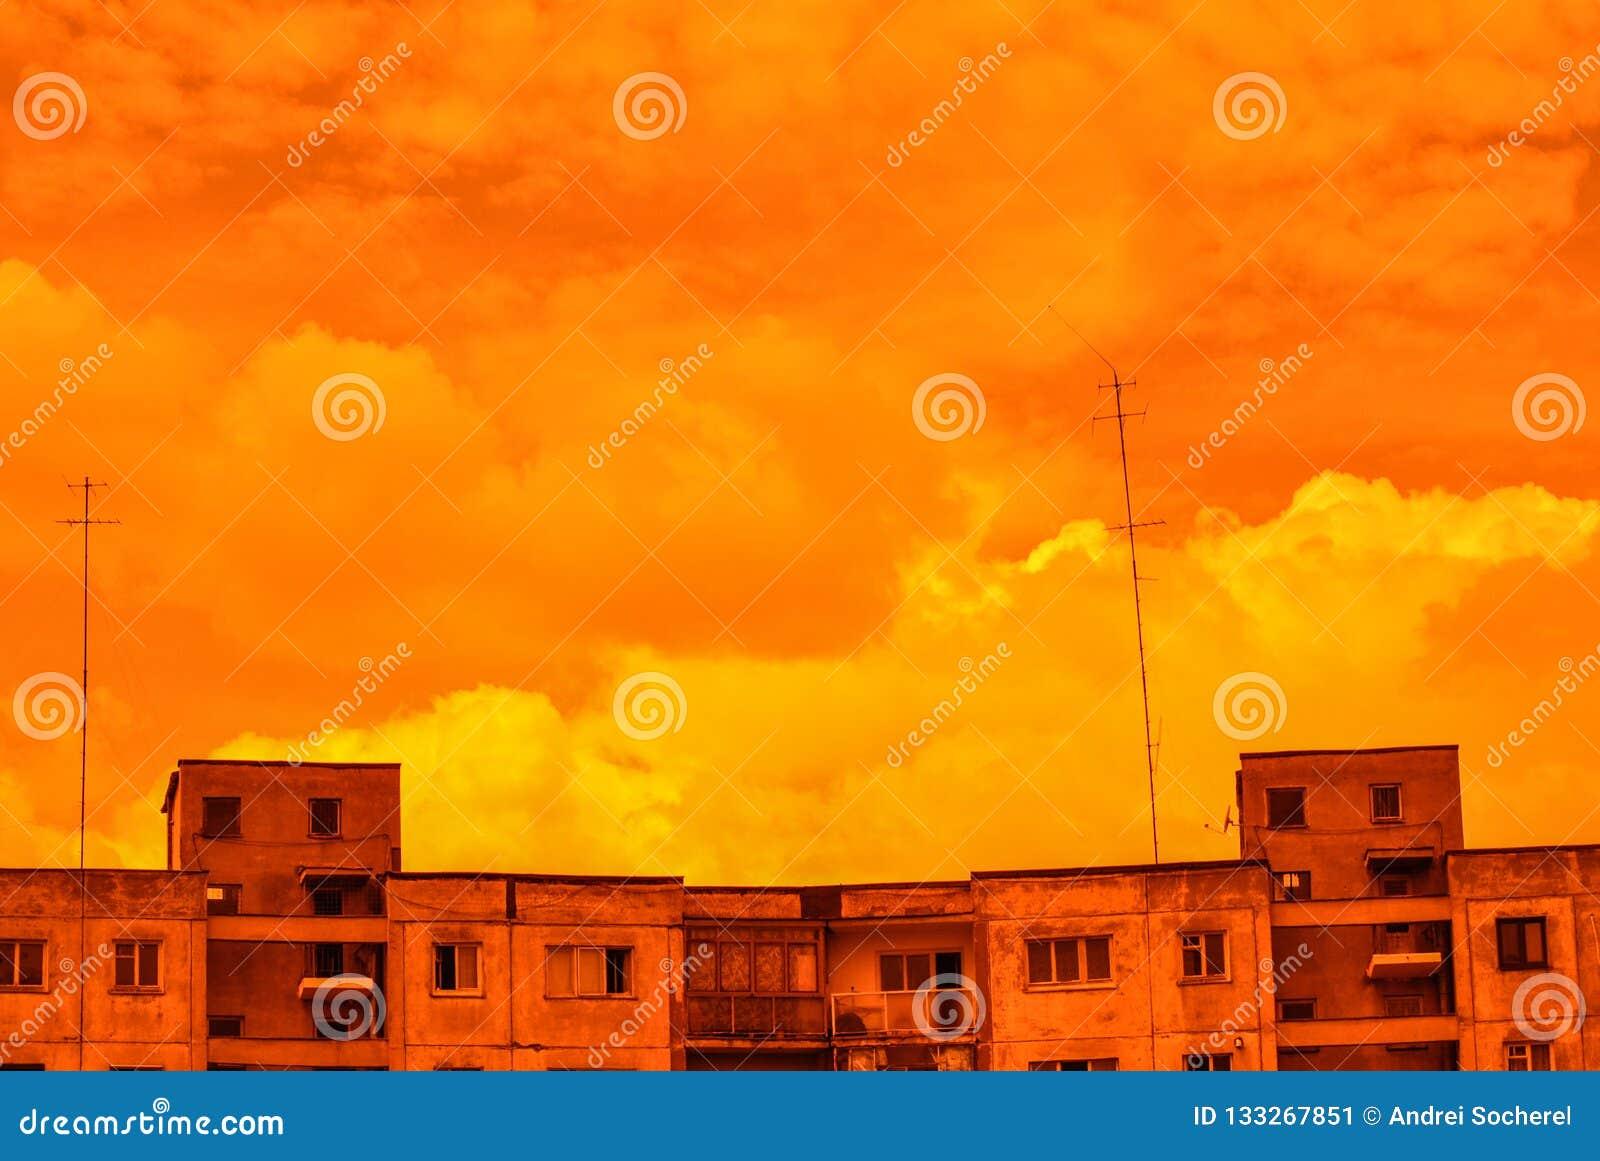 Orange Soviet Antennae Skyline